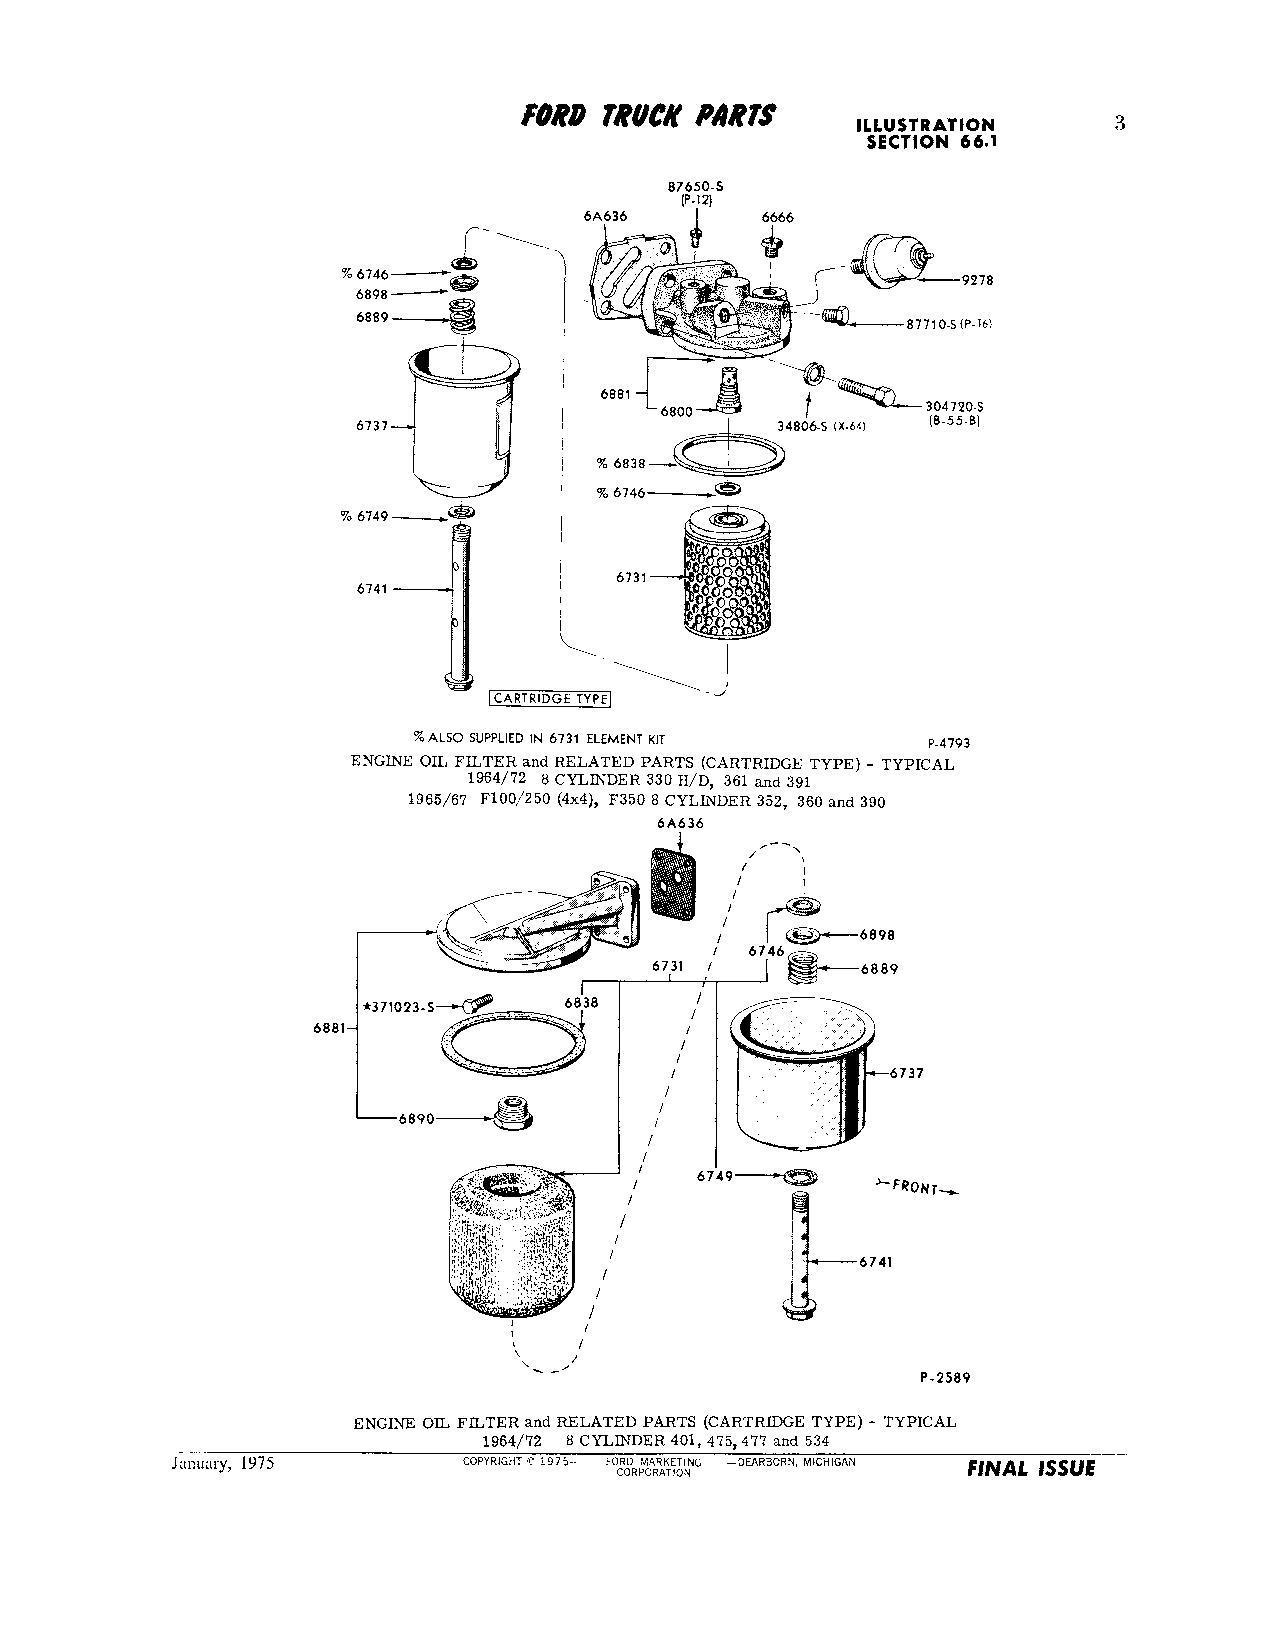 477 534 Super Duty Engine Oil Filter Housing Gasket